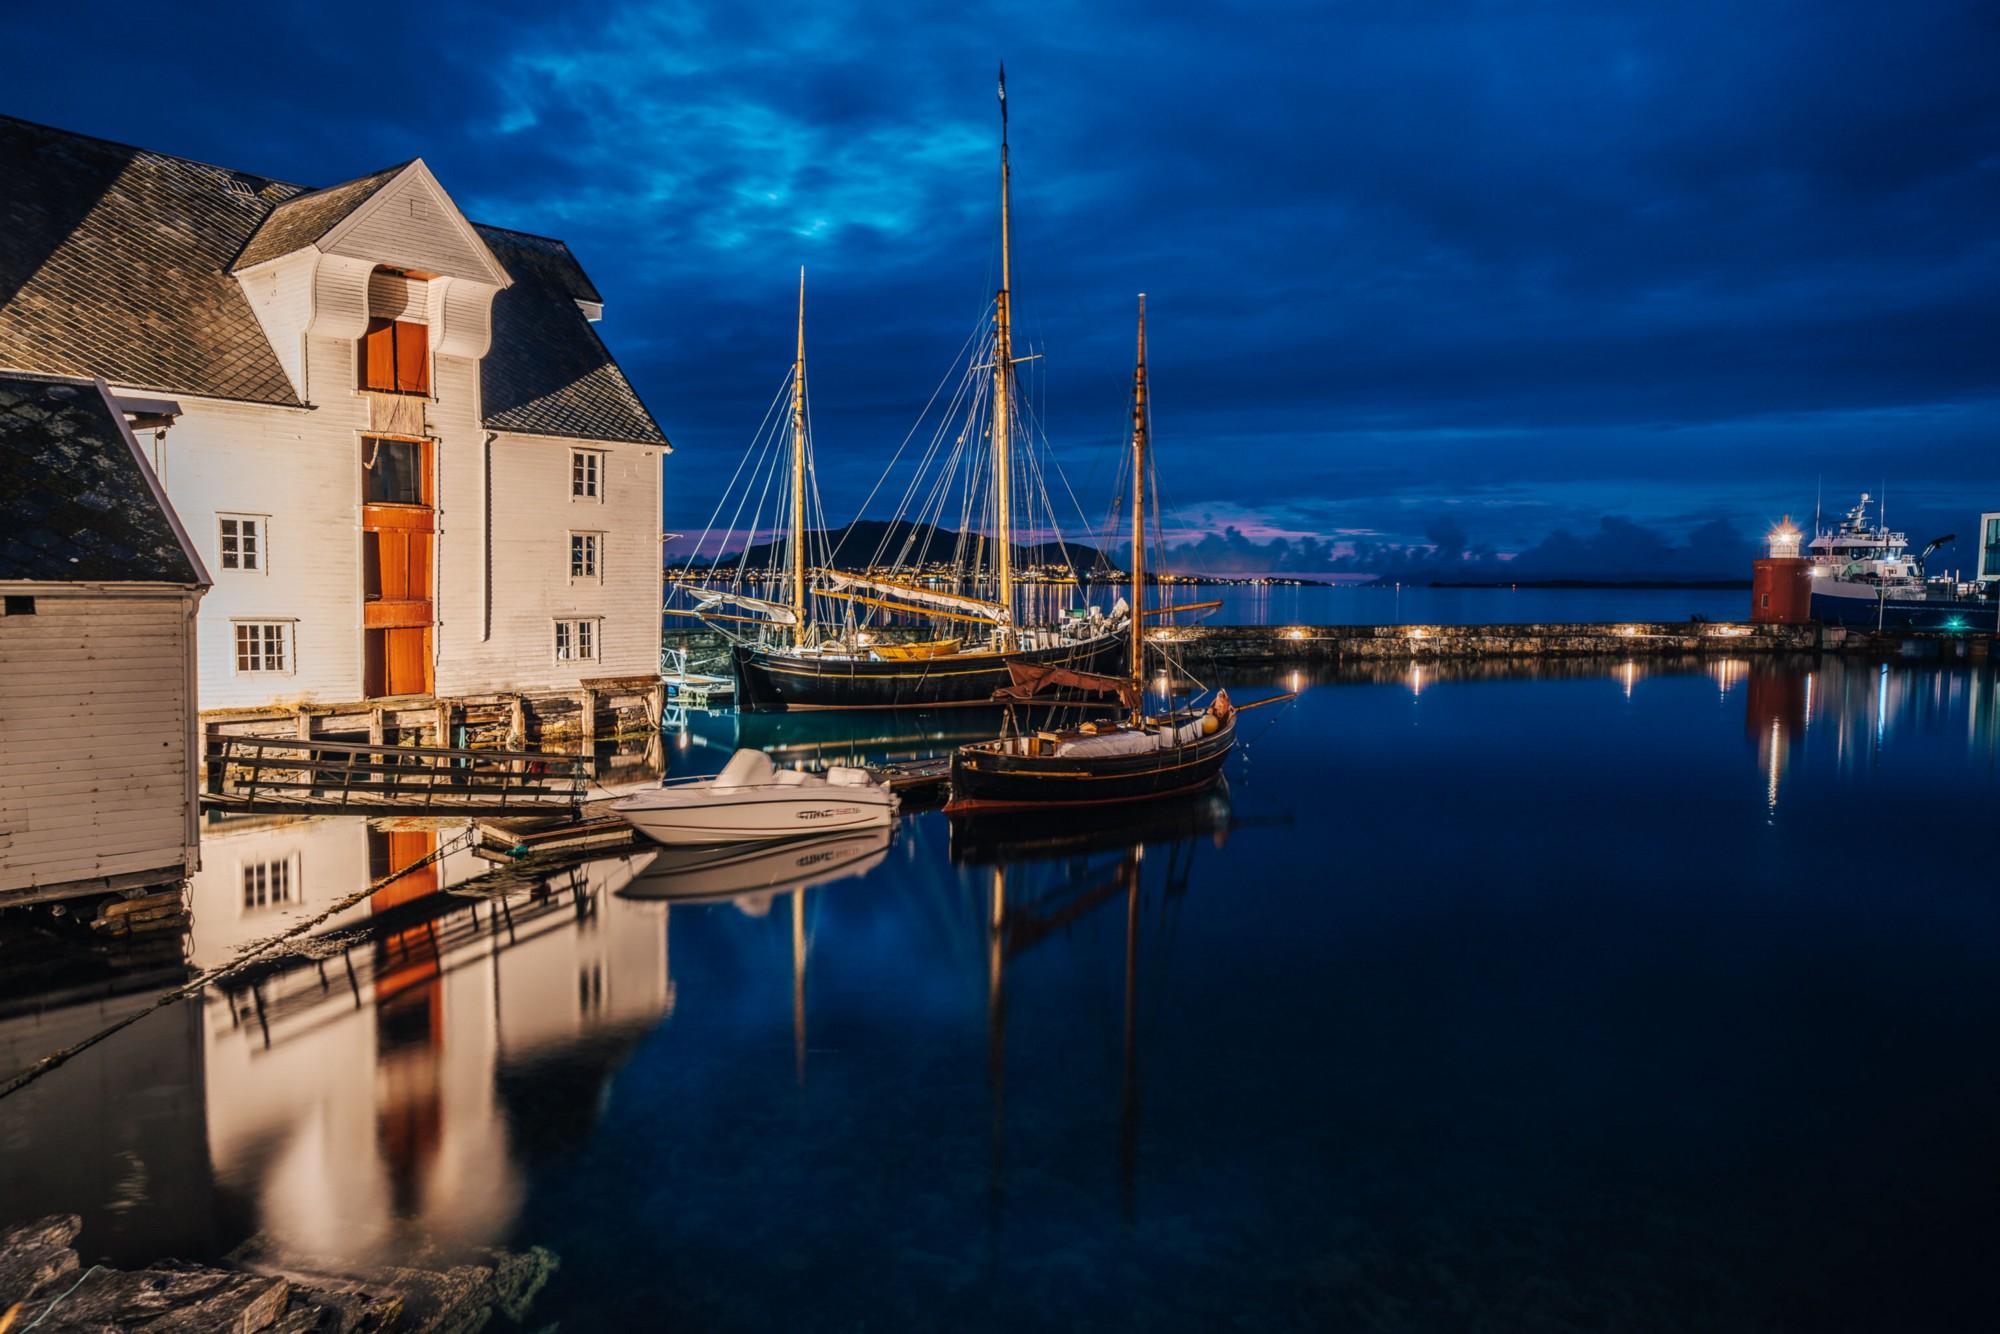 Port of Ålesund photographed at night |  Jakub Fišer